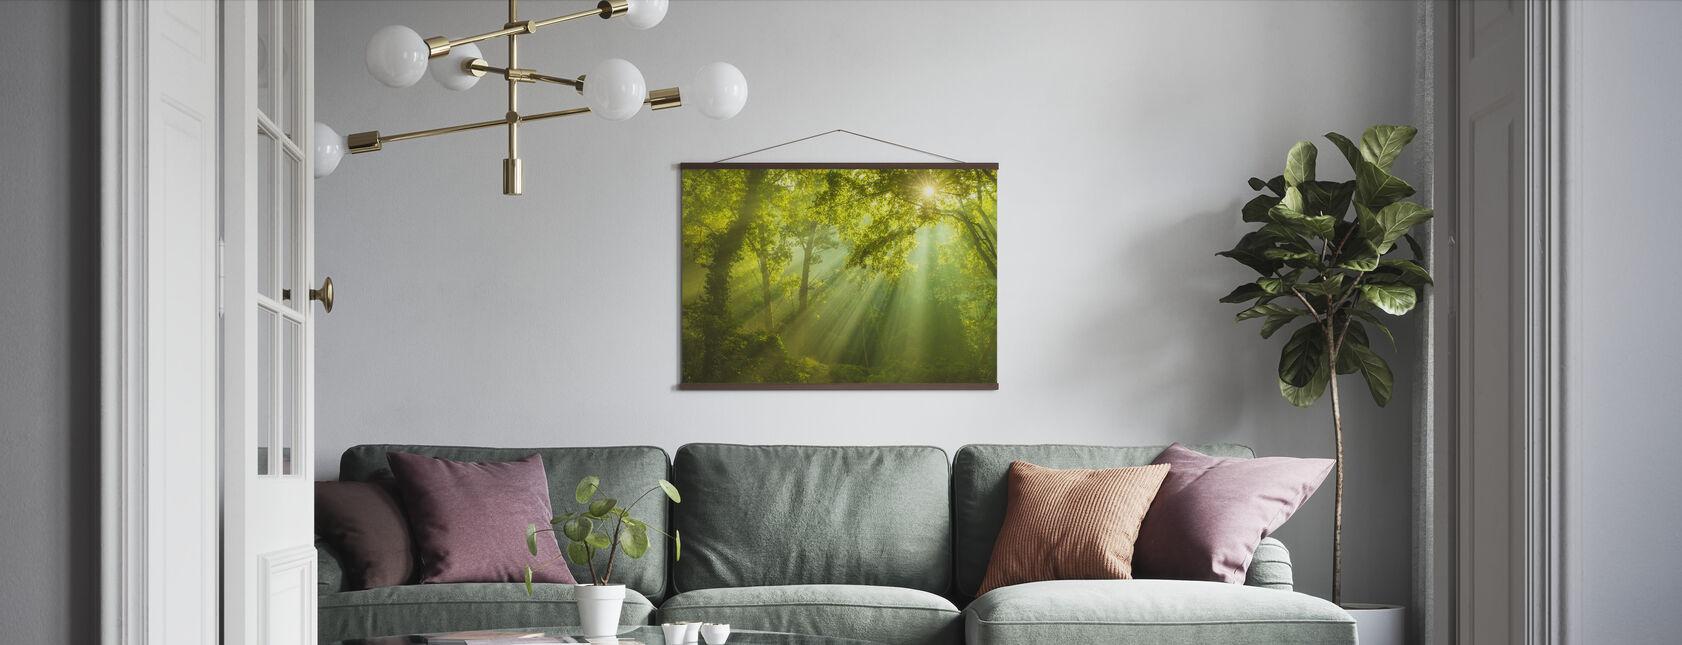 Groen Bos Zonlicht - Poster - Woonkamer